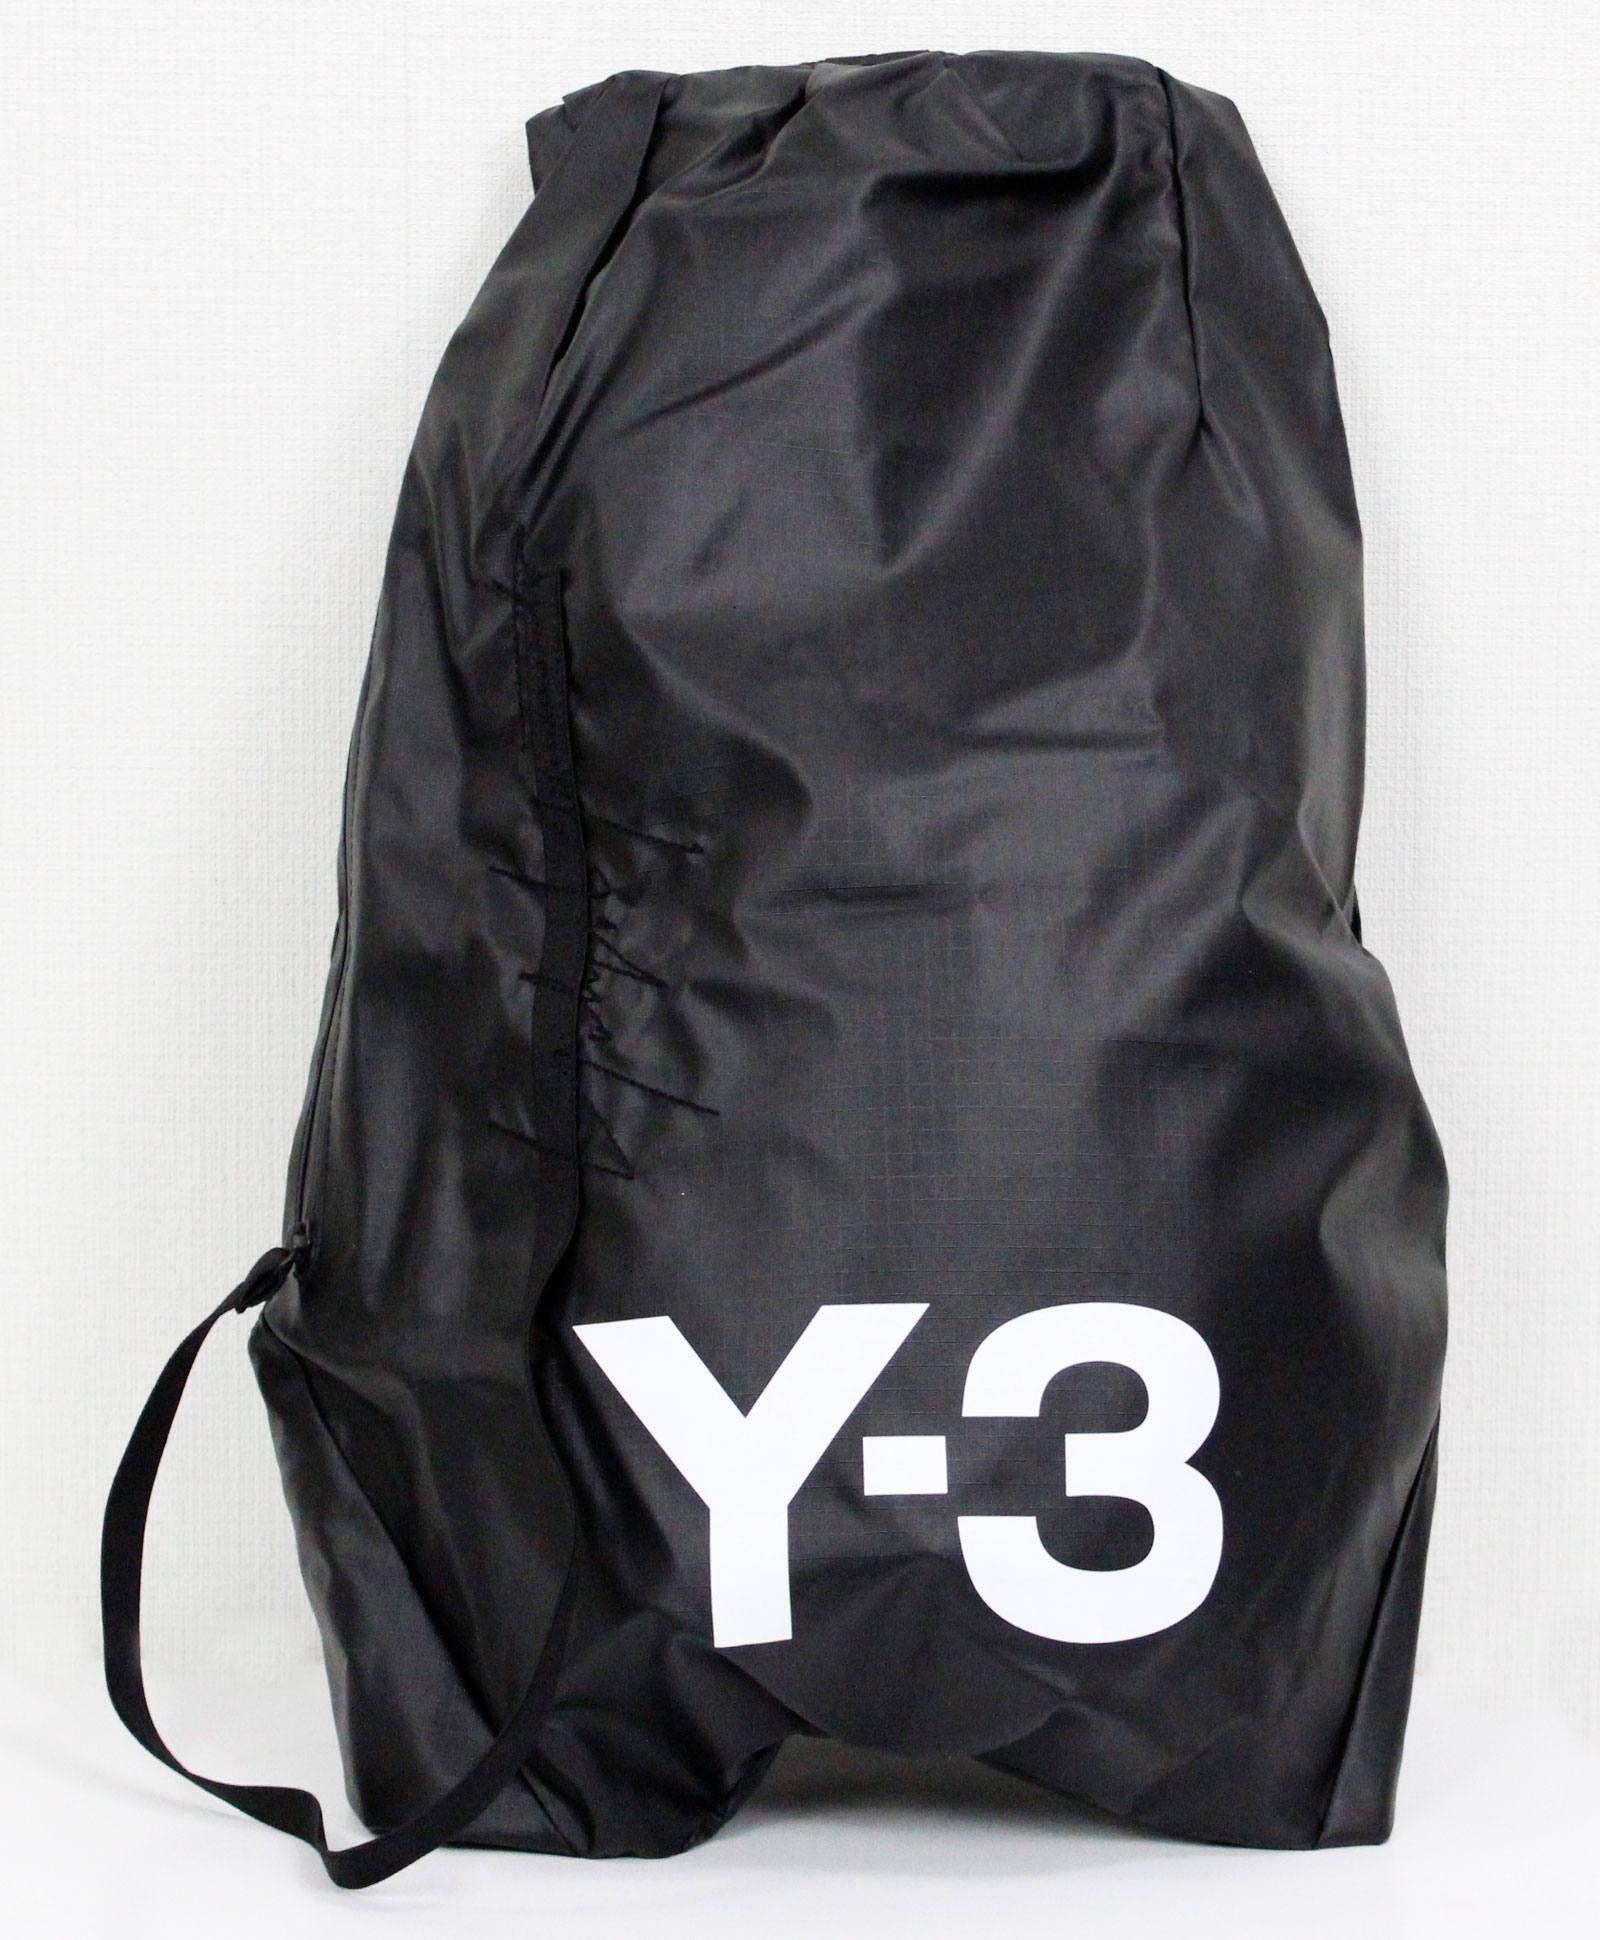 bf428fa3ff3e Y-3 - バックパック / Y-3 YOHJI BP II / [DY0517-ACCS19] / BLACK   MAVERICK GROUP  ONLINE STORE